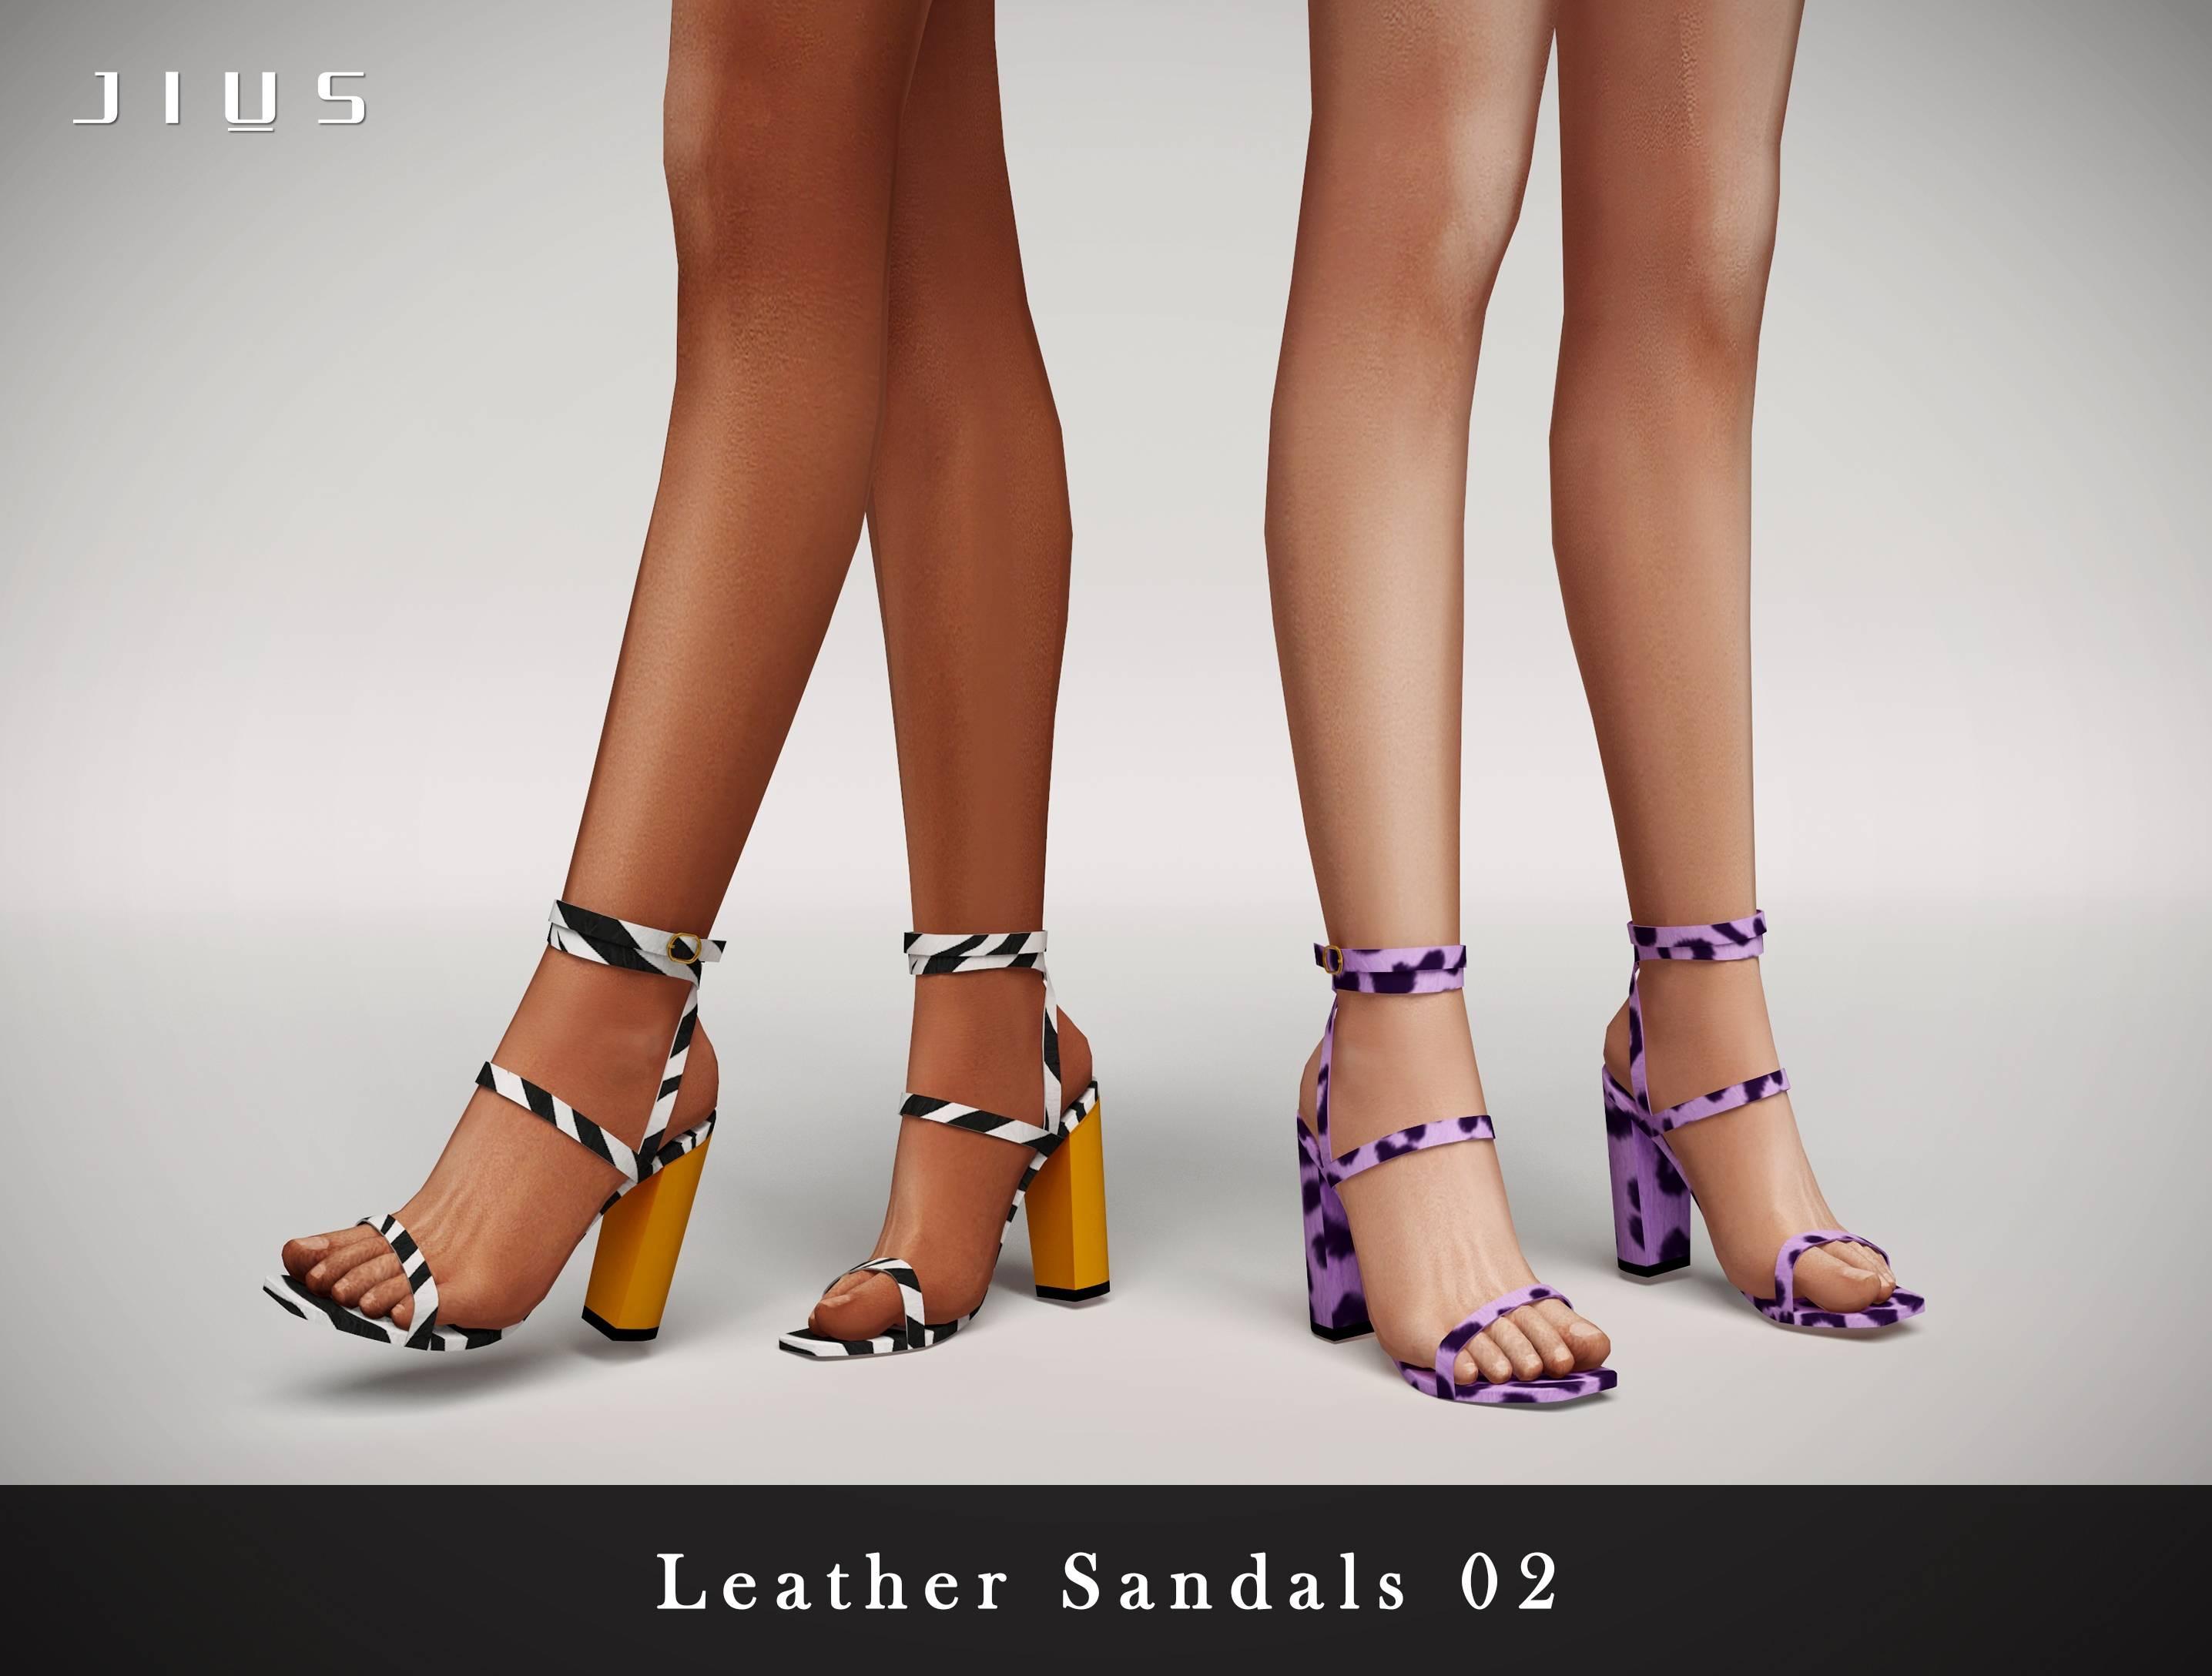 Босоножки - Leather Sandals 02